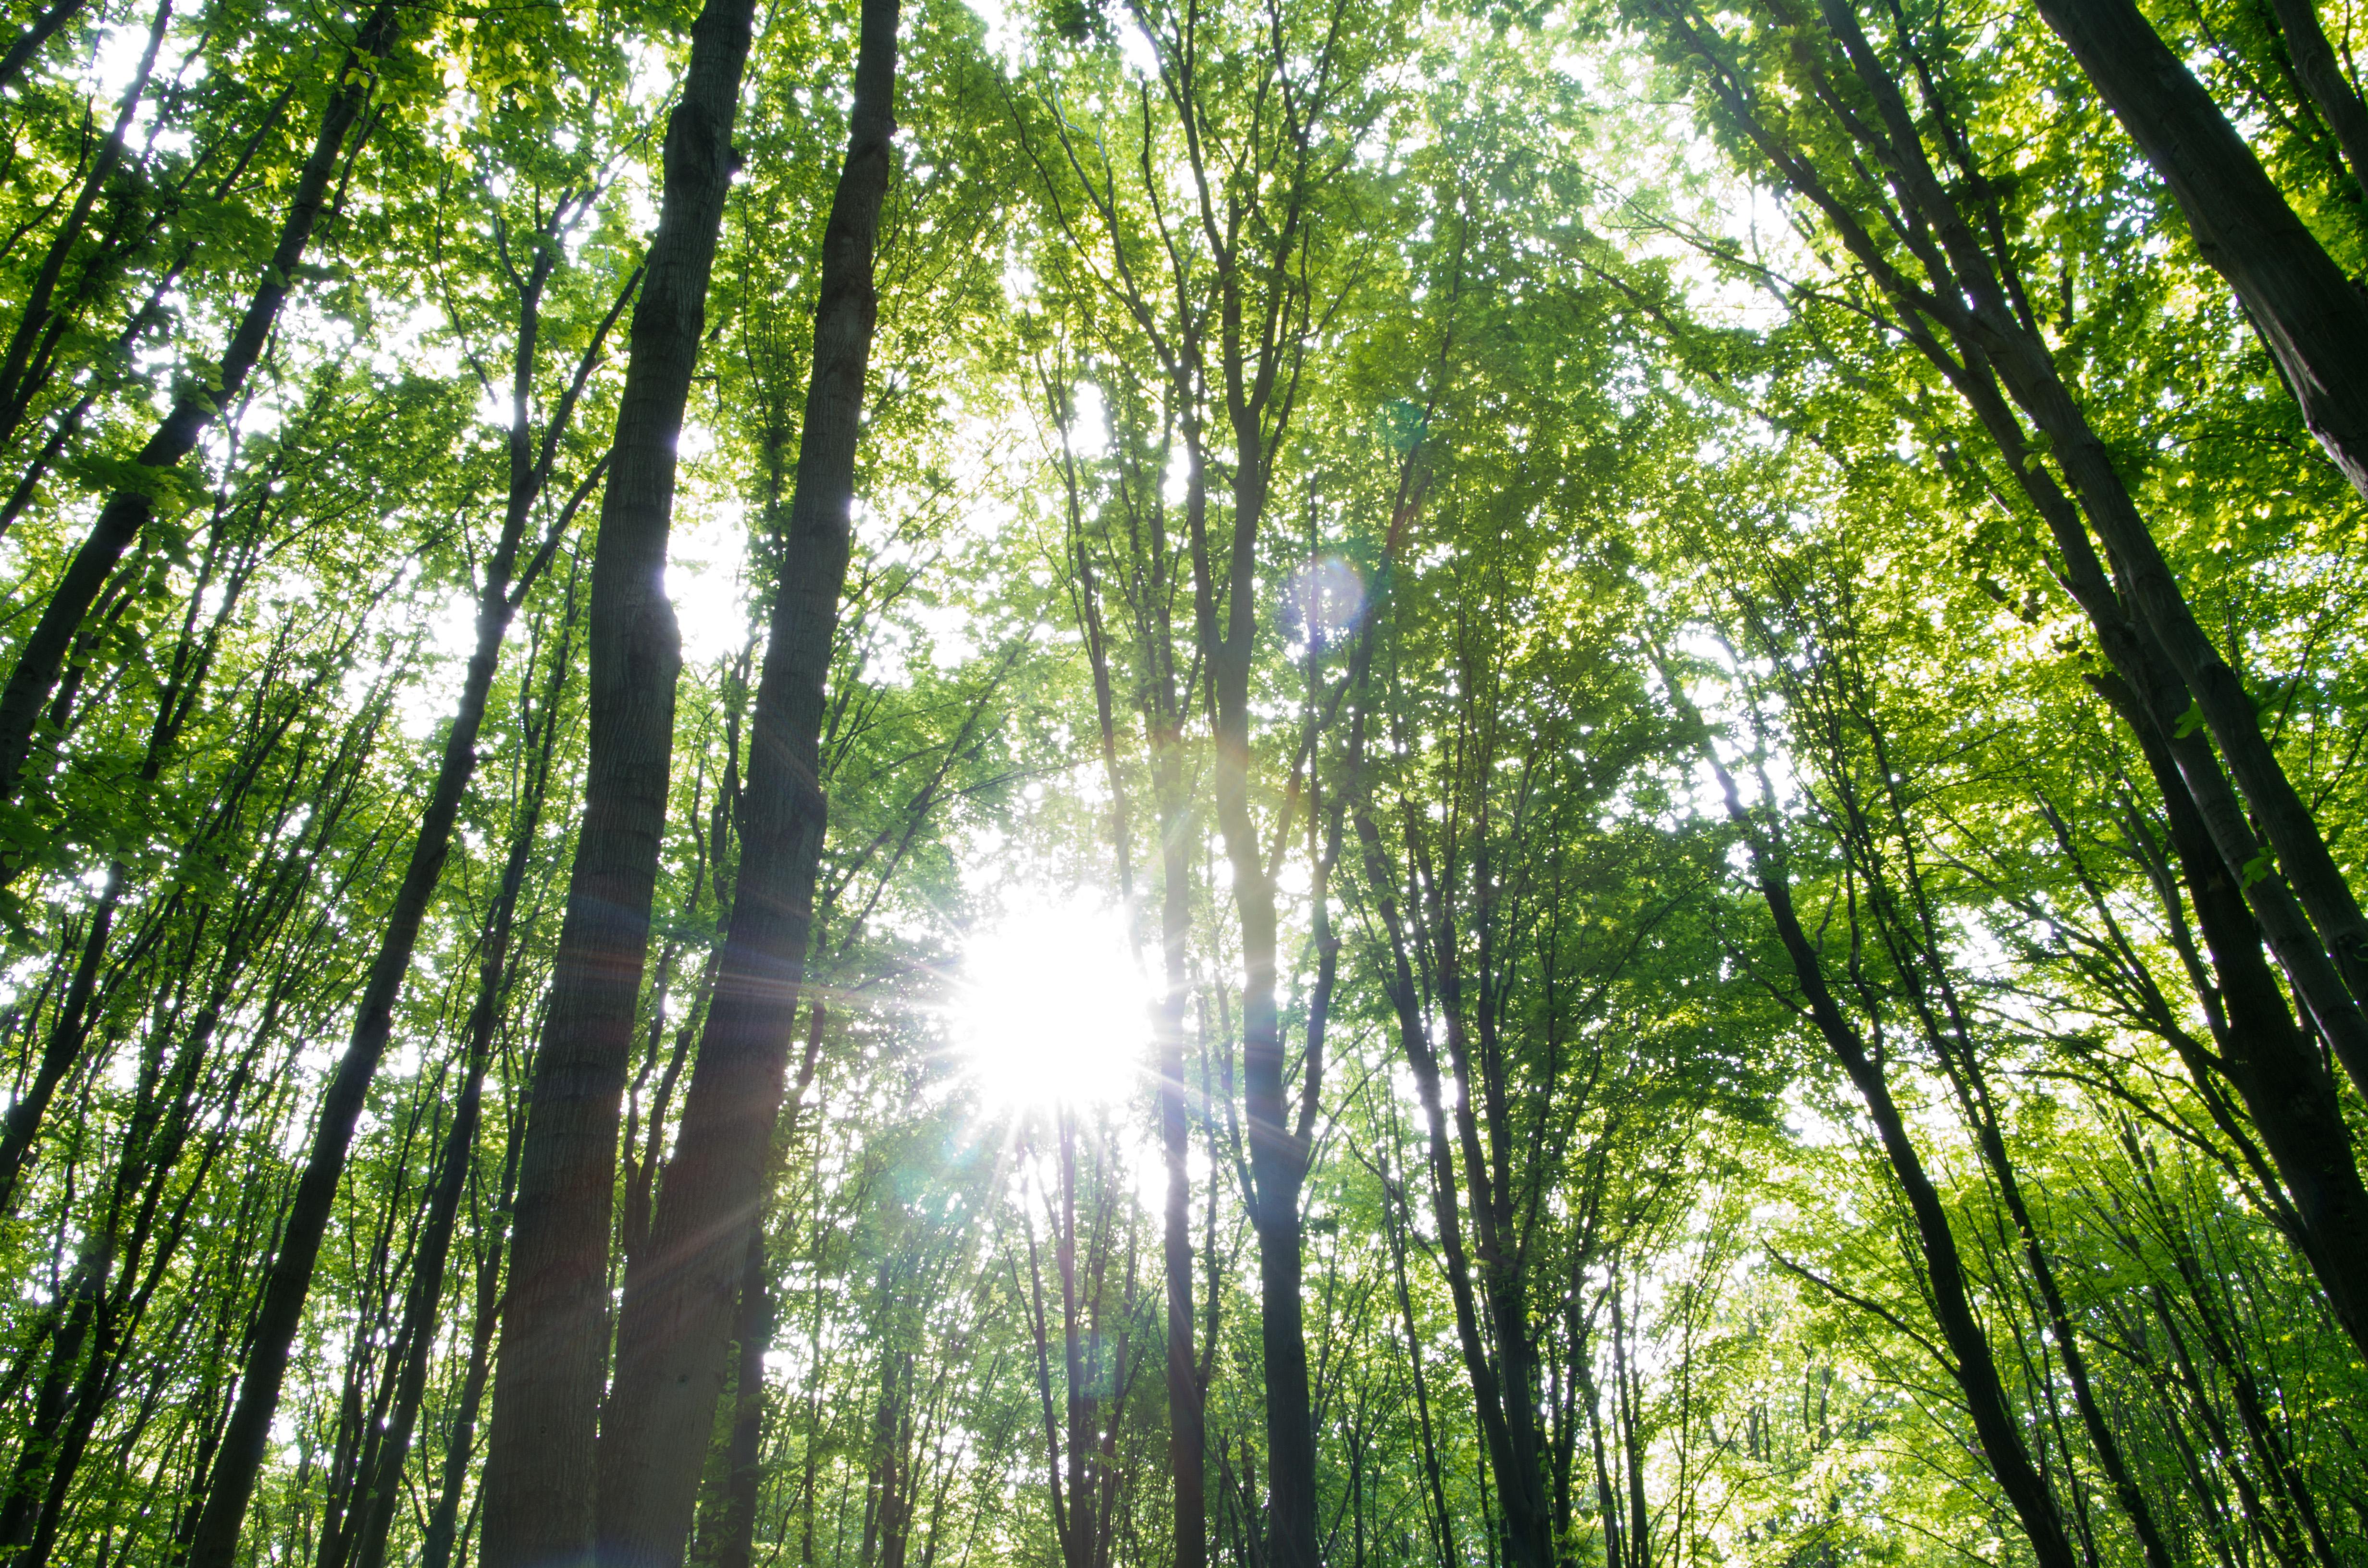 Anonym donor giver 1,7 mio. kroner til klimaindsamling